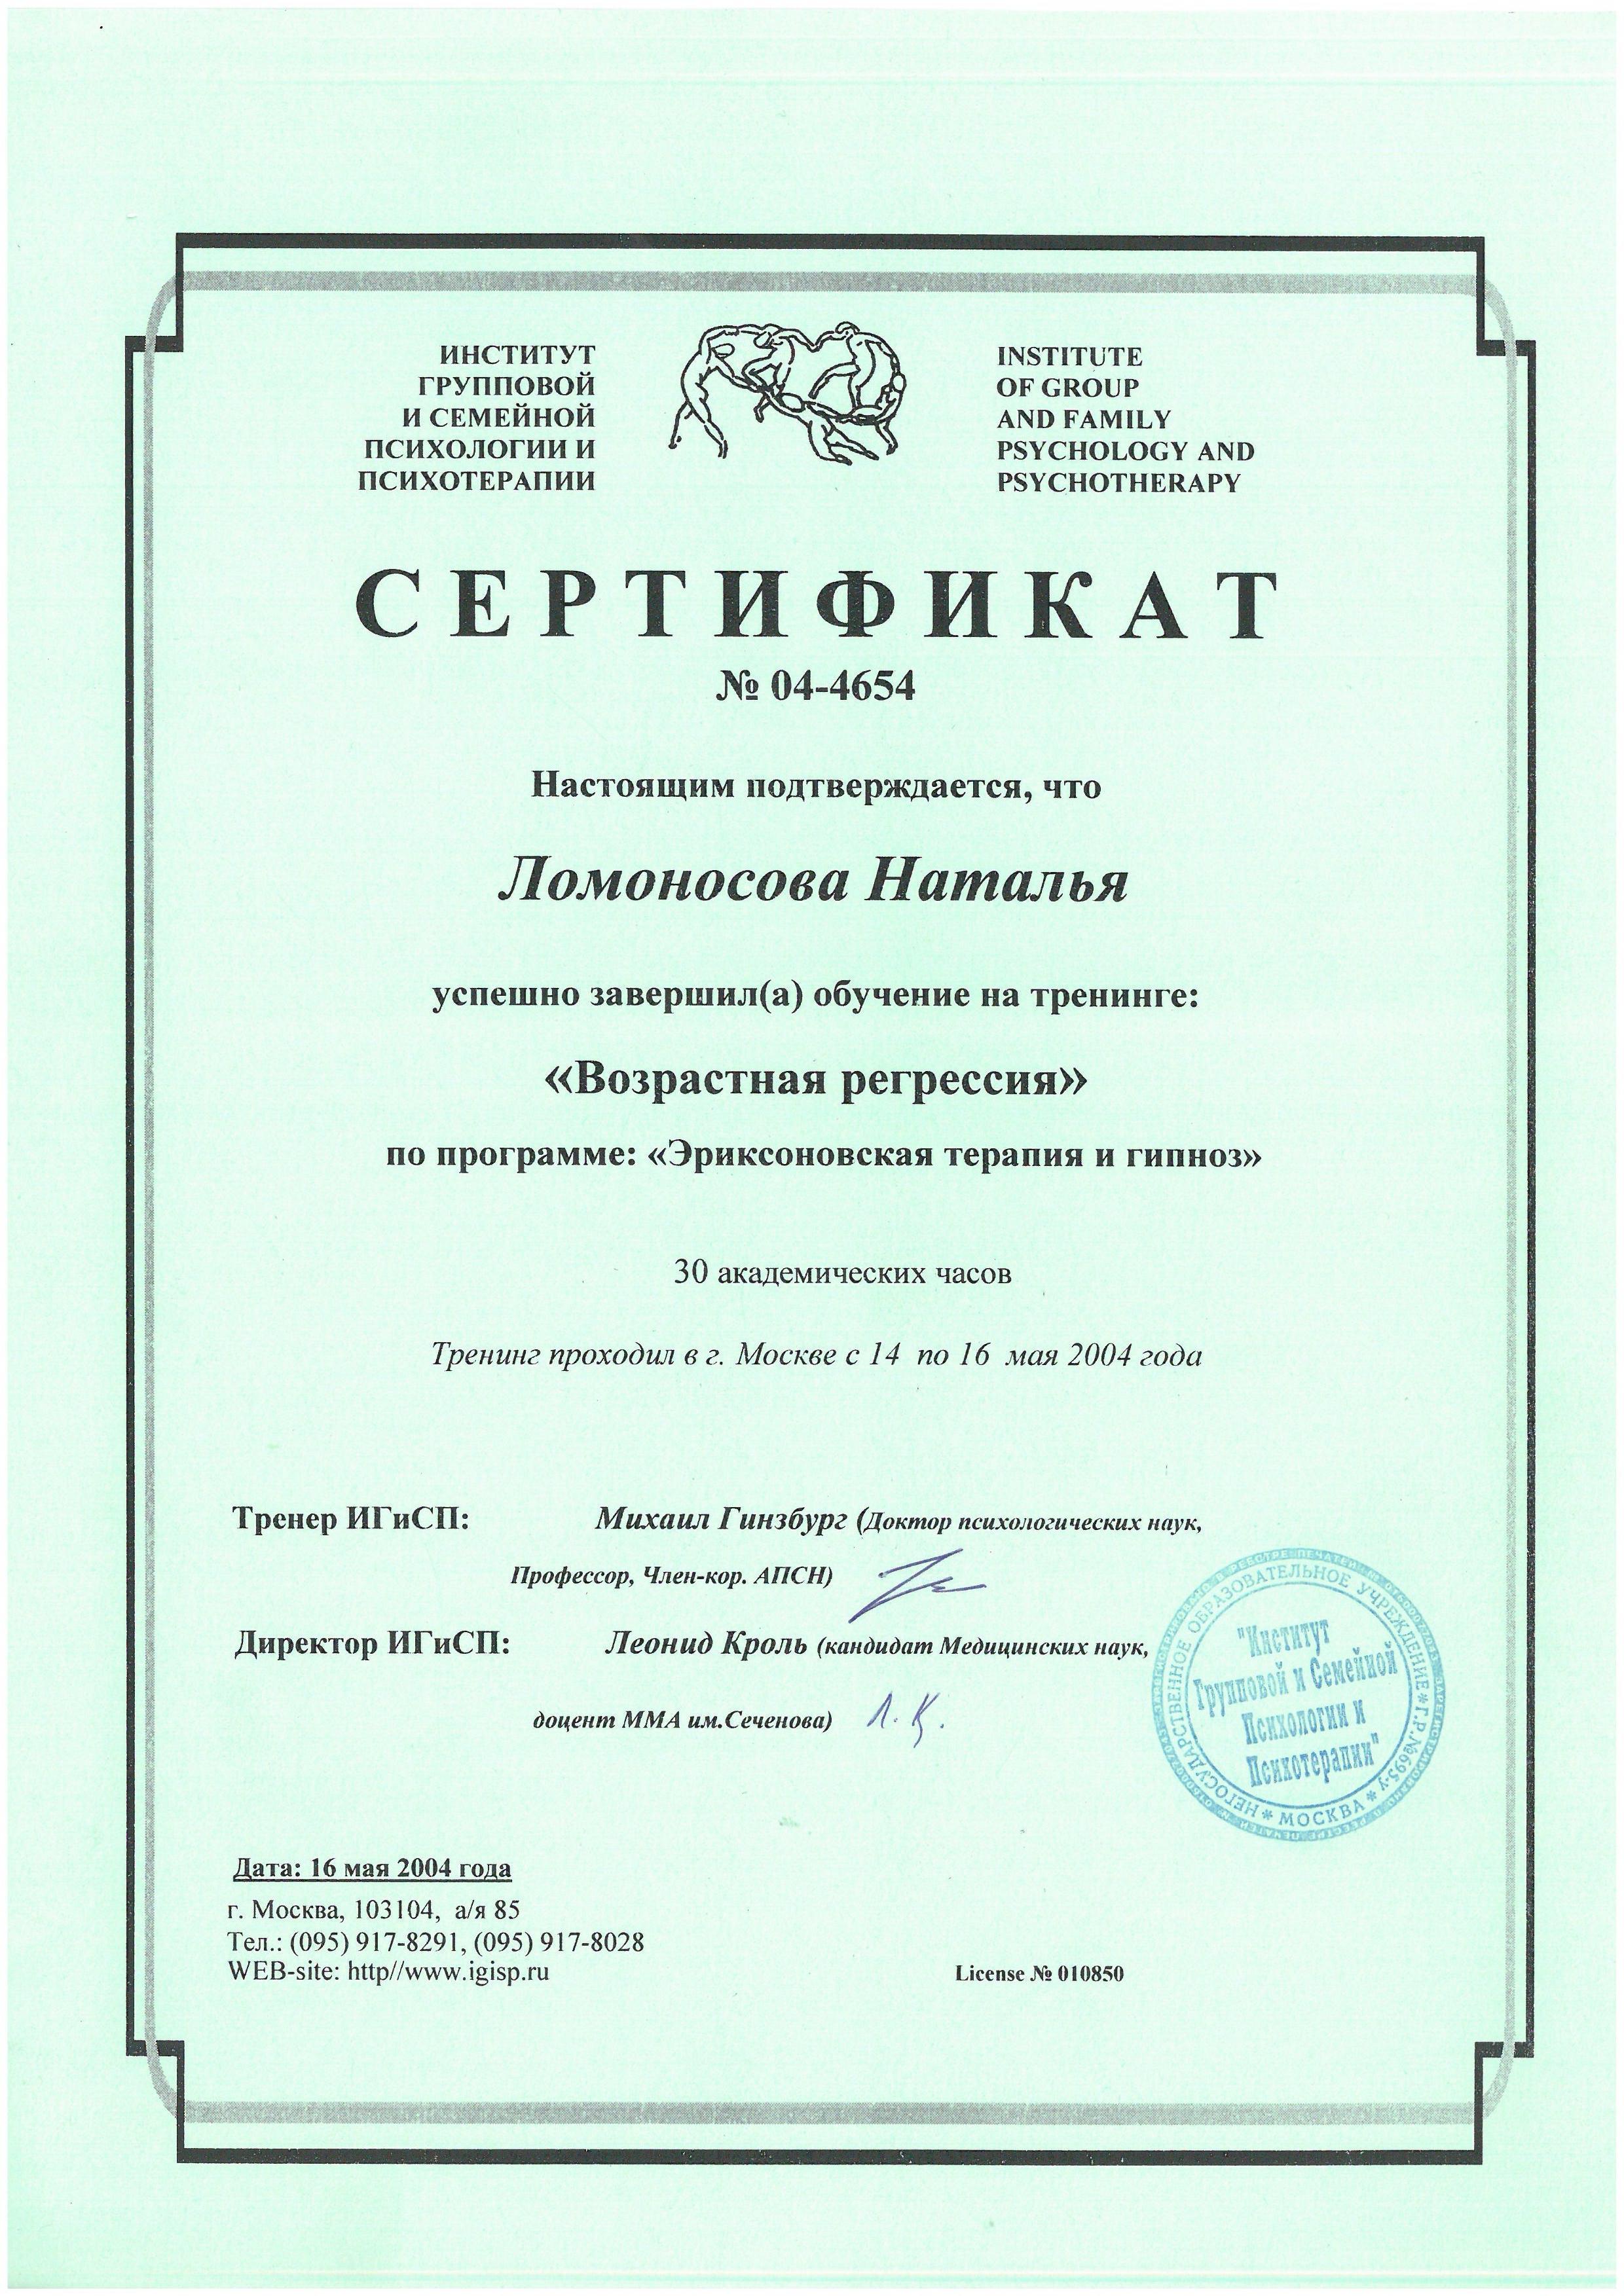 SKMBT_C224e17060618120_Сторінка_25.jpg